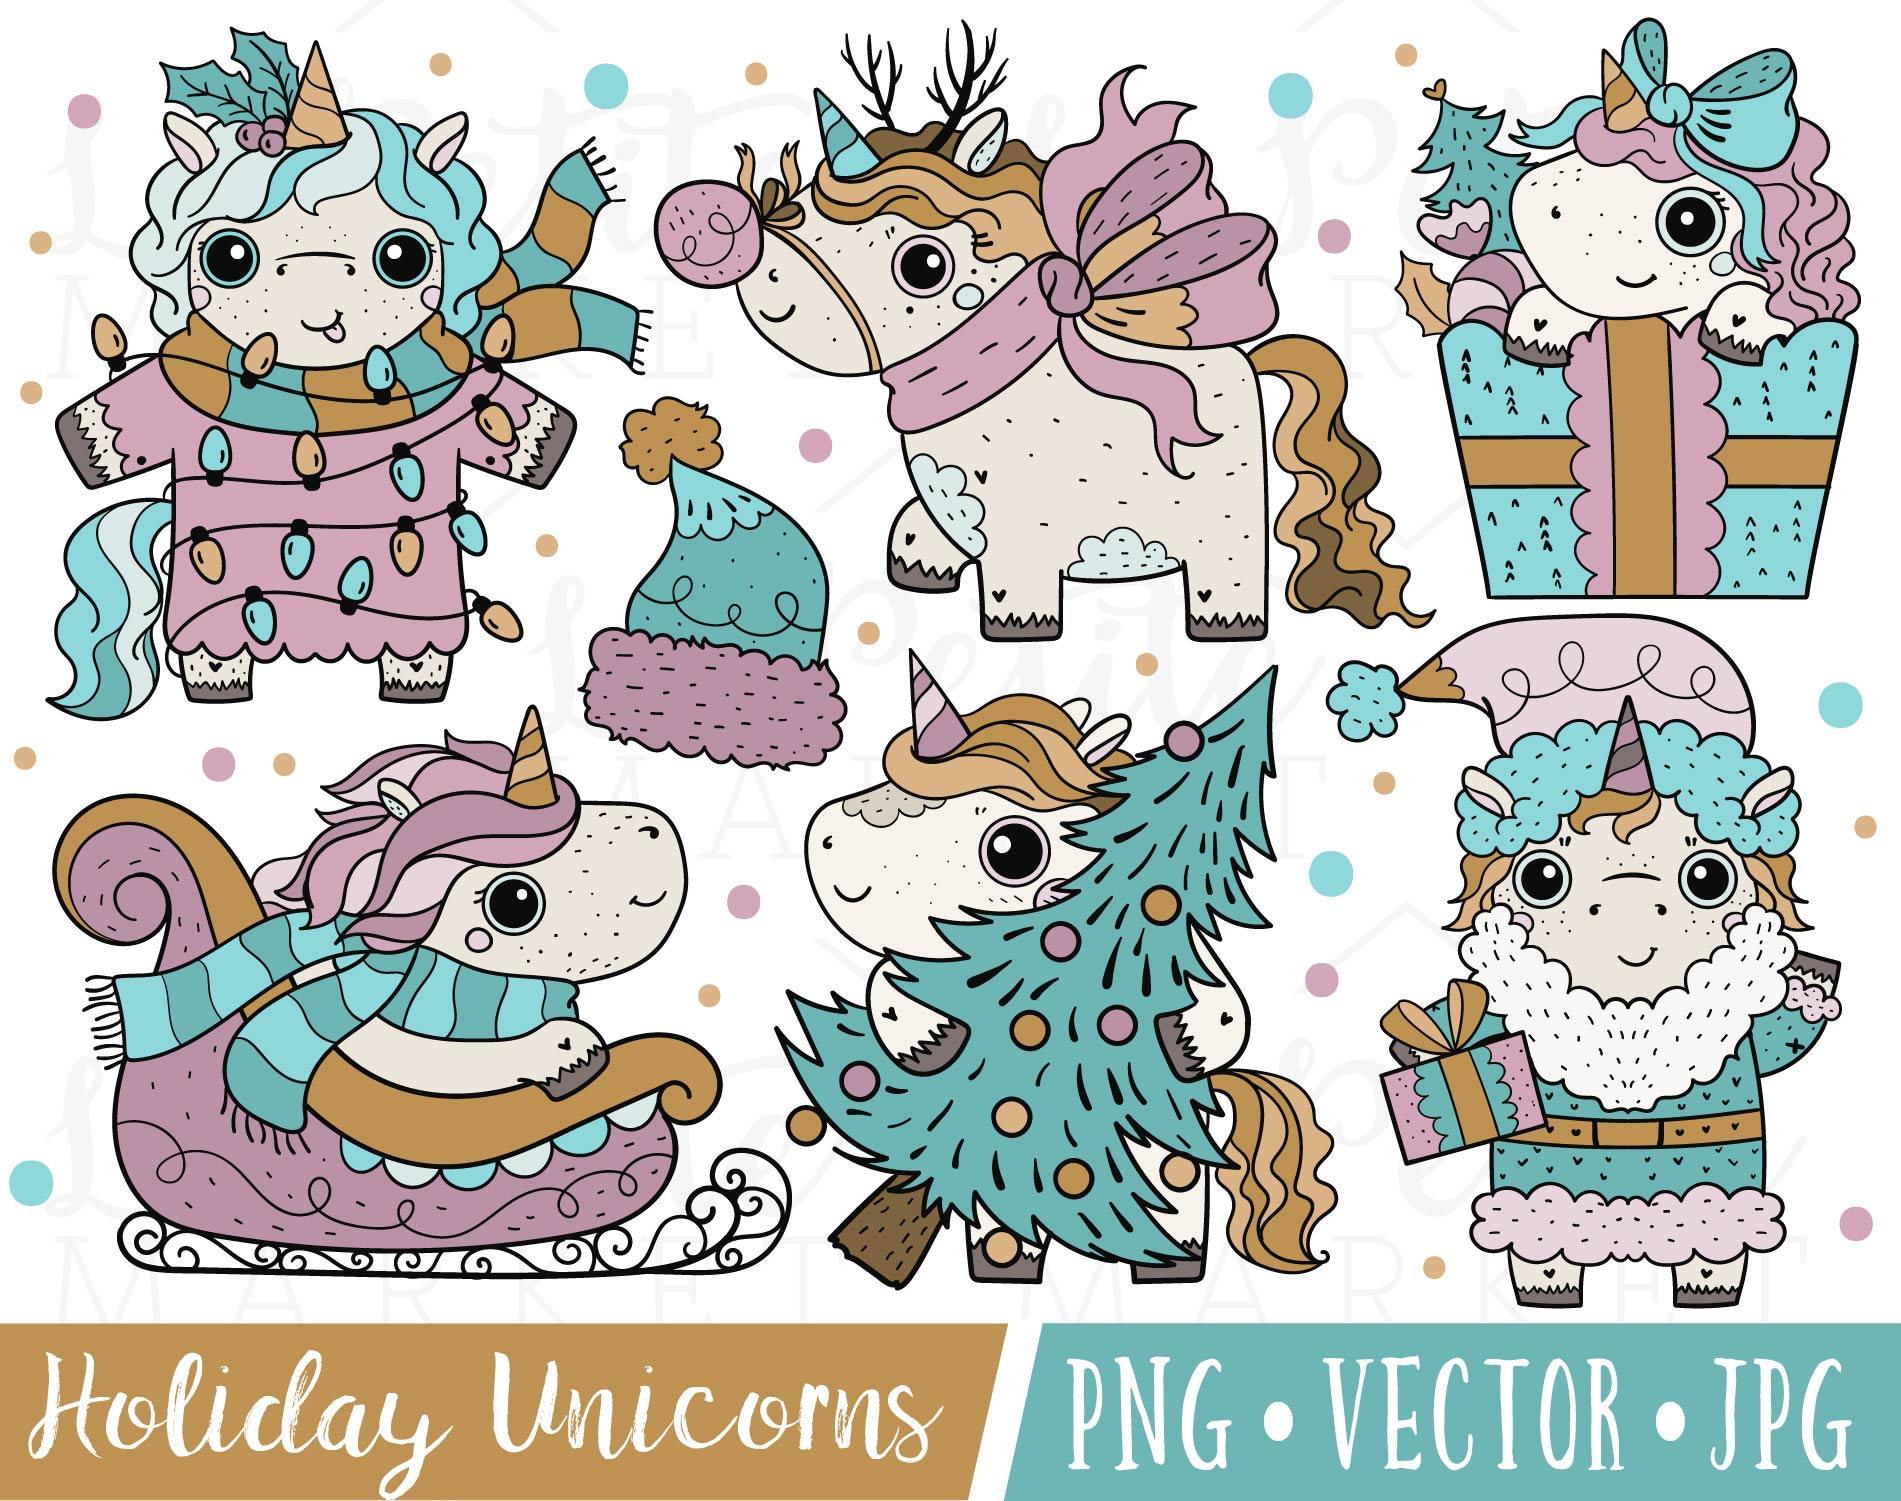 Christmas Unicorn Clipart Images Holiday Unicorn Clip Art ...